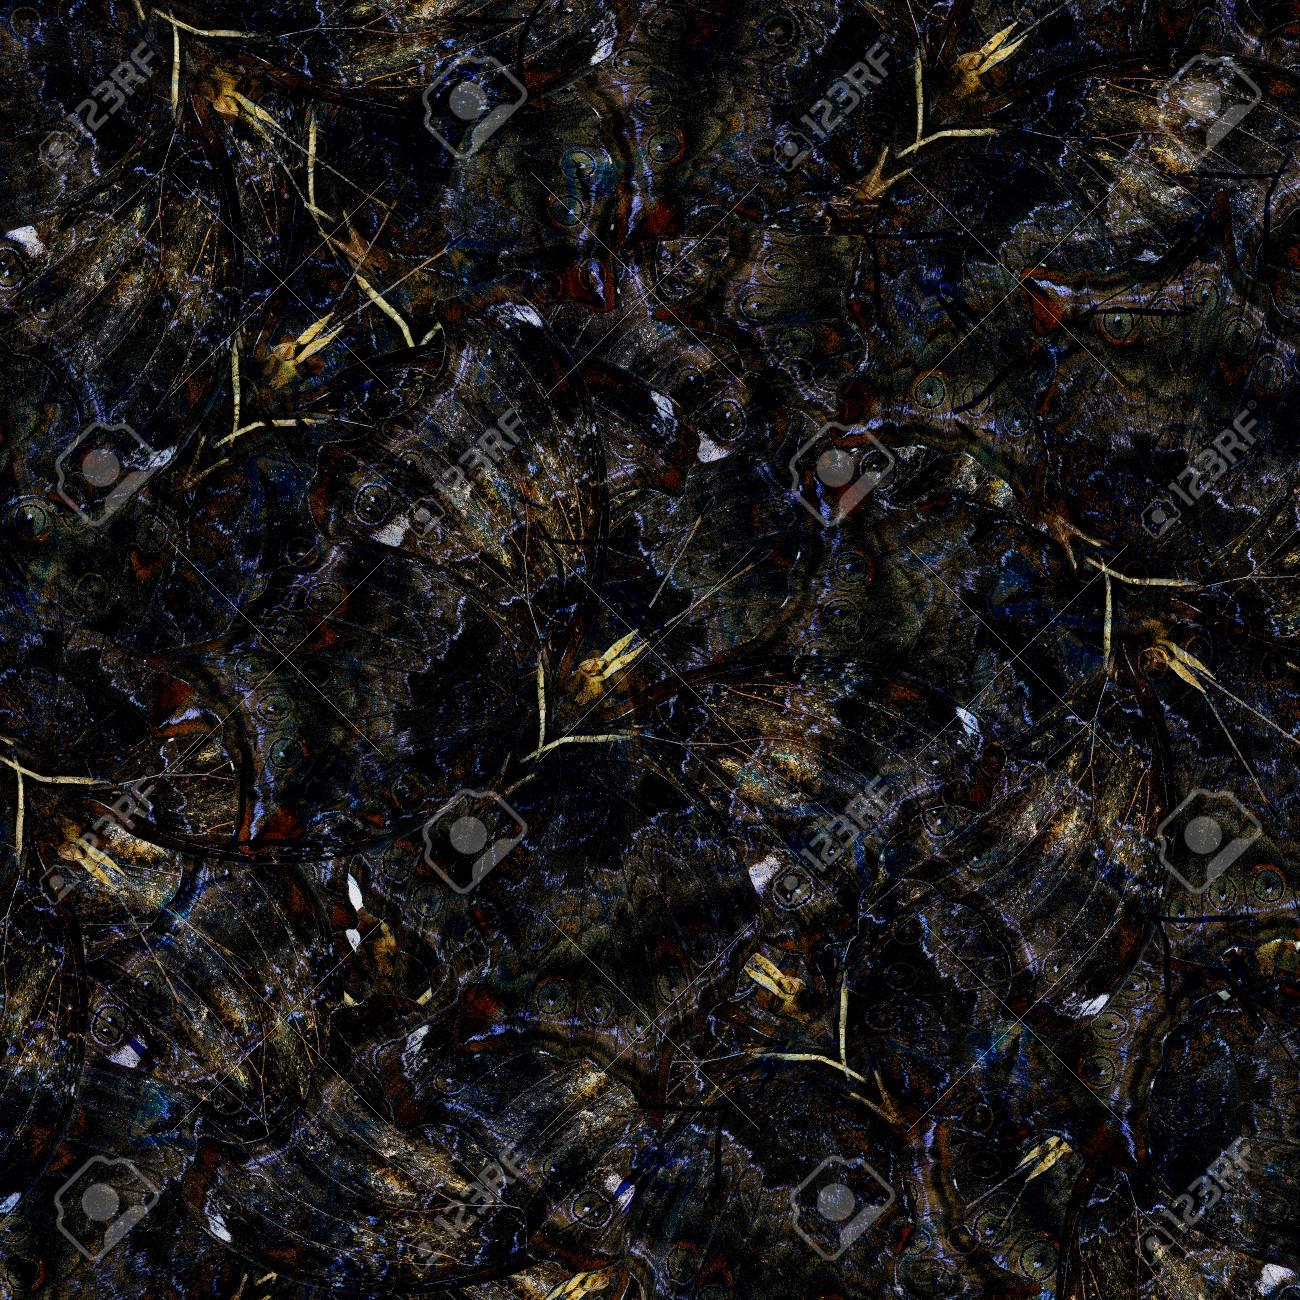 extotic dark blue background texture made of wizard butterflies